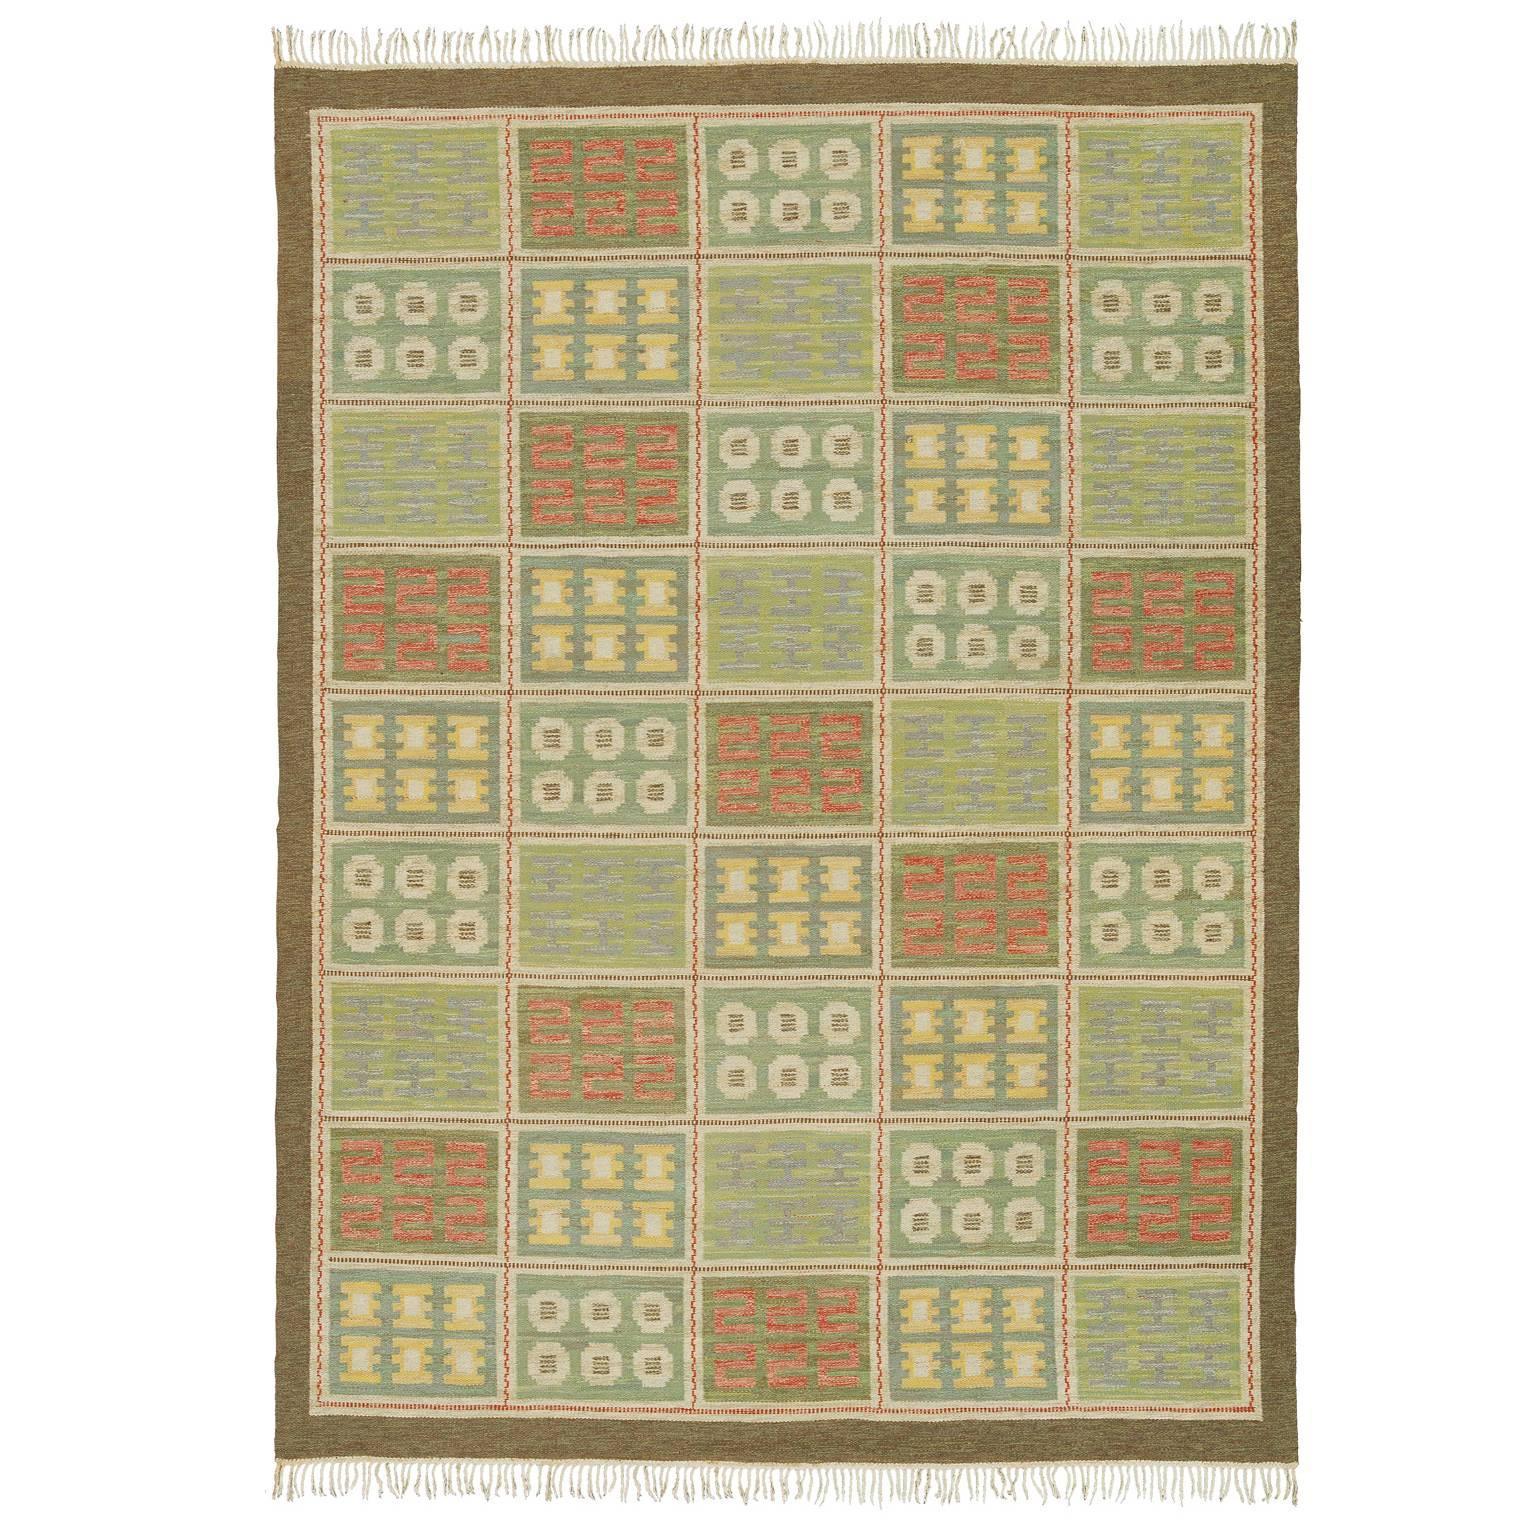 20th Century Swedish Flat-Weave Carpet by Edna Martin, Svensk Hemslöjd